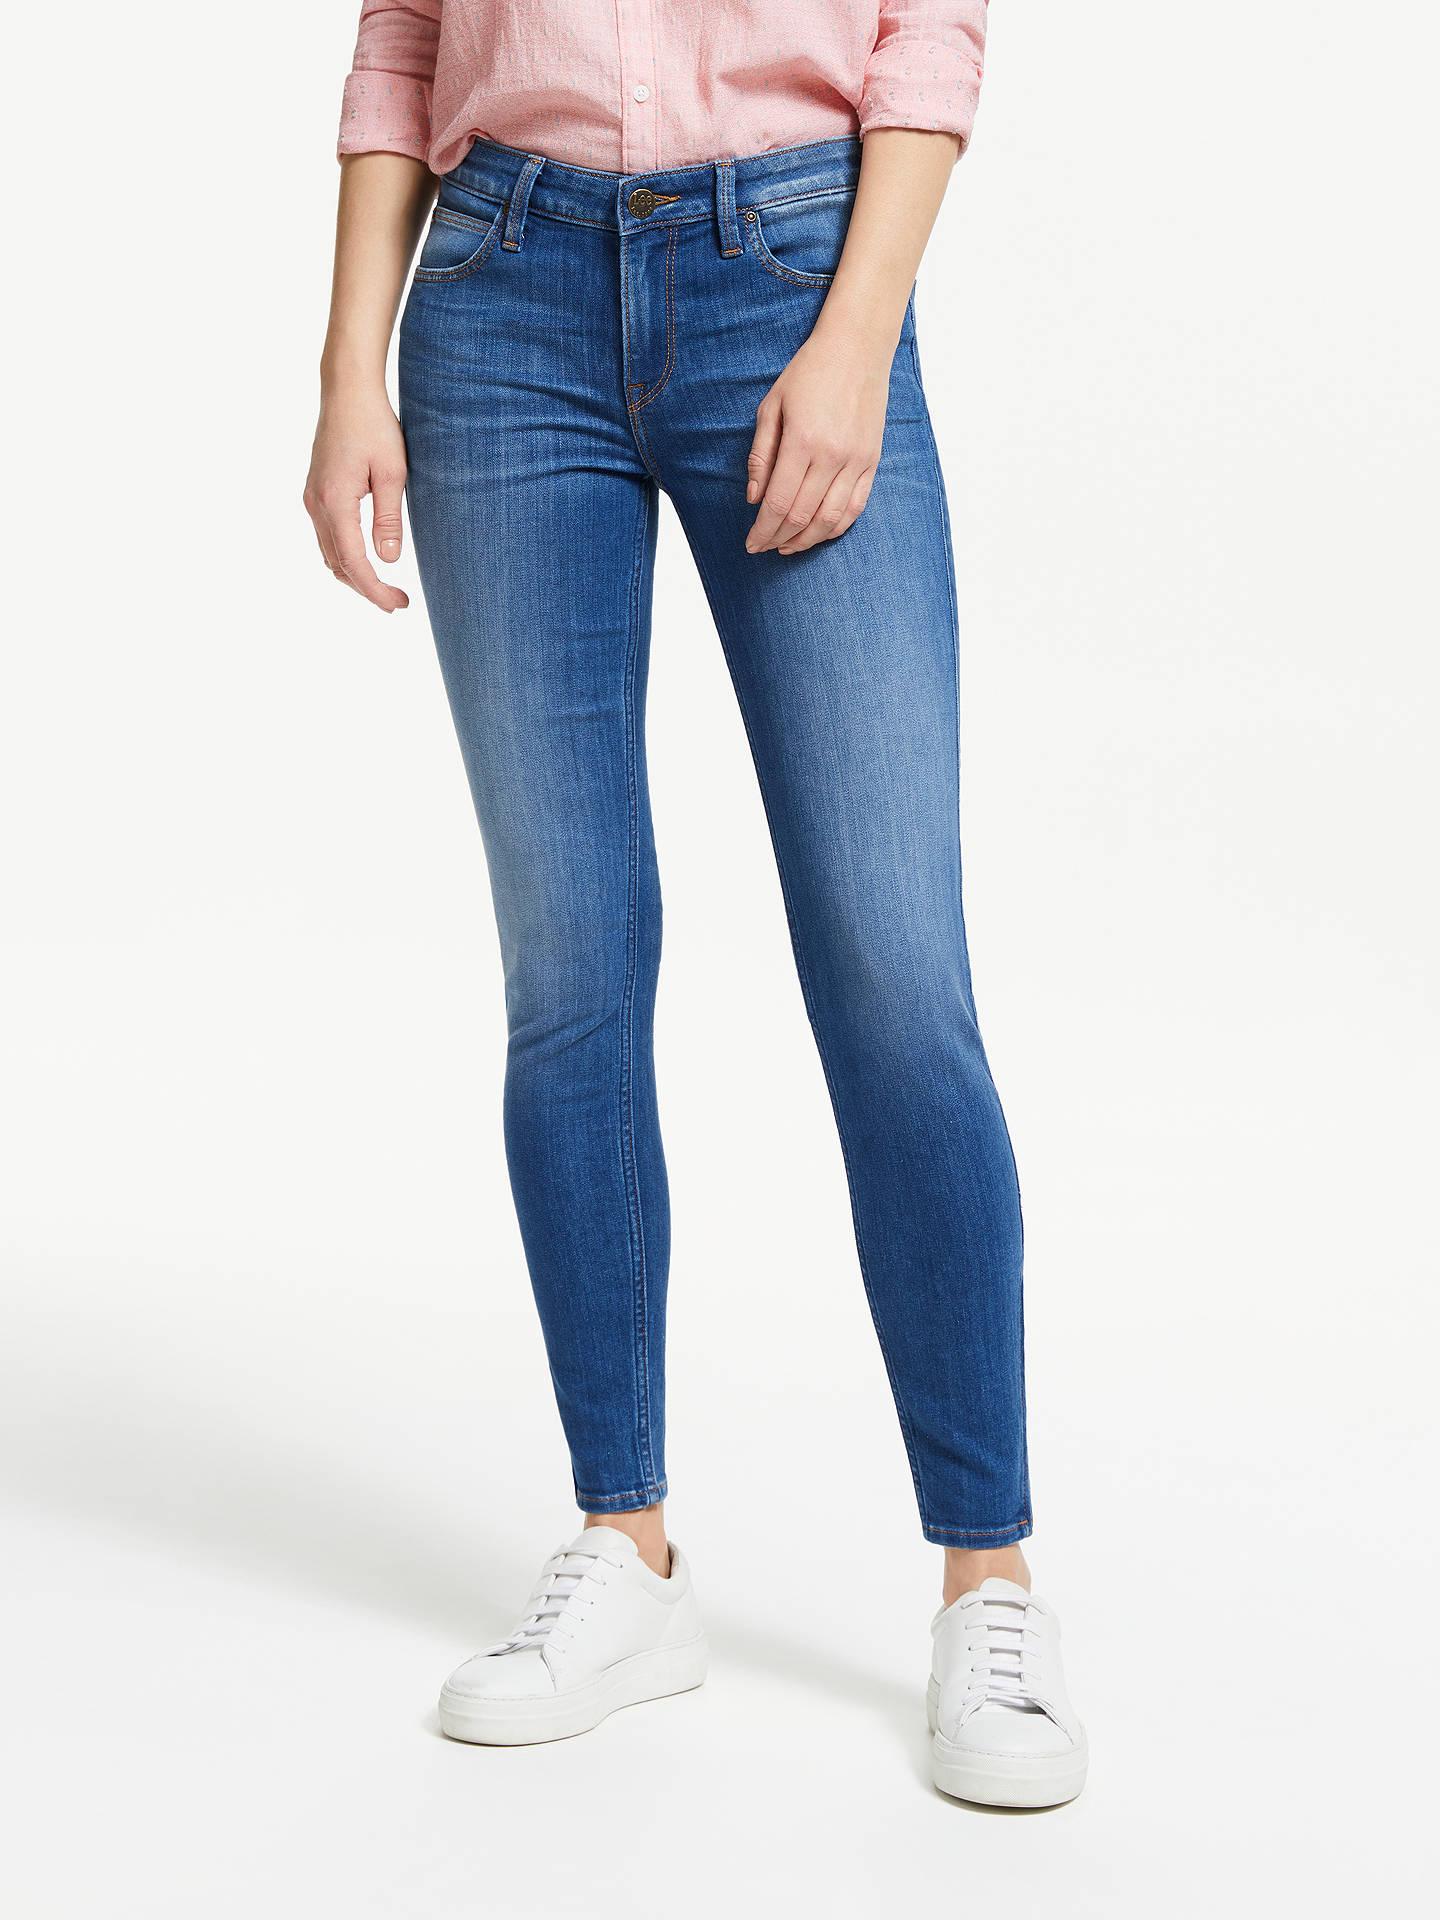 5944981f3da Lee Scarlett Mid Rise Cropped Skinny Jeans